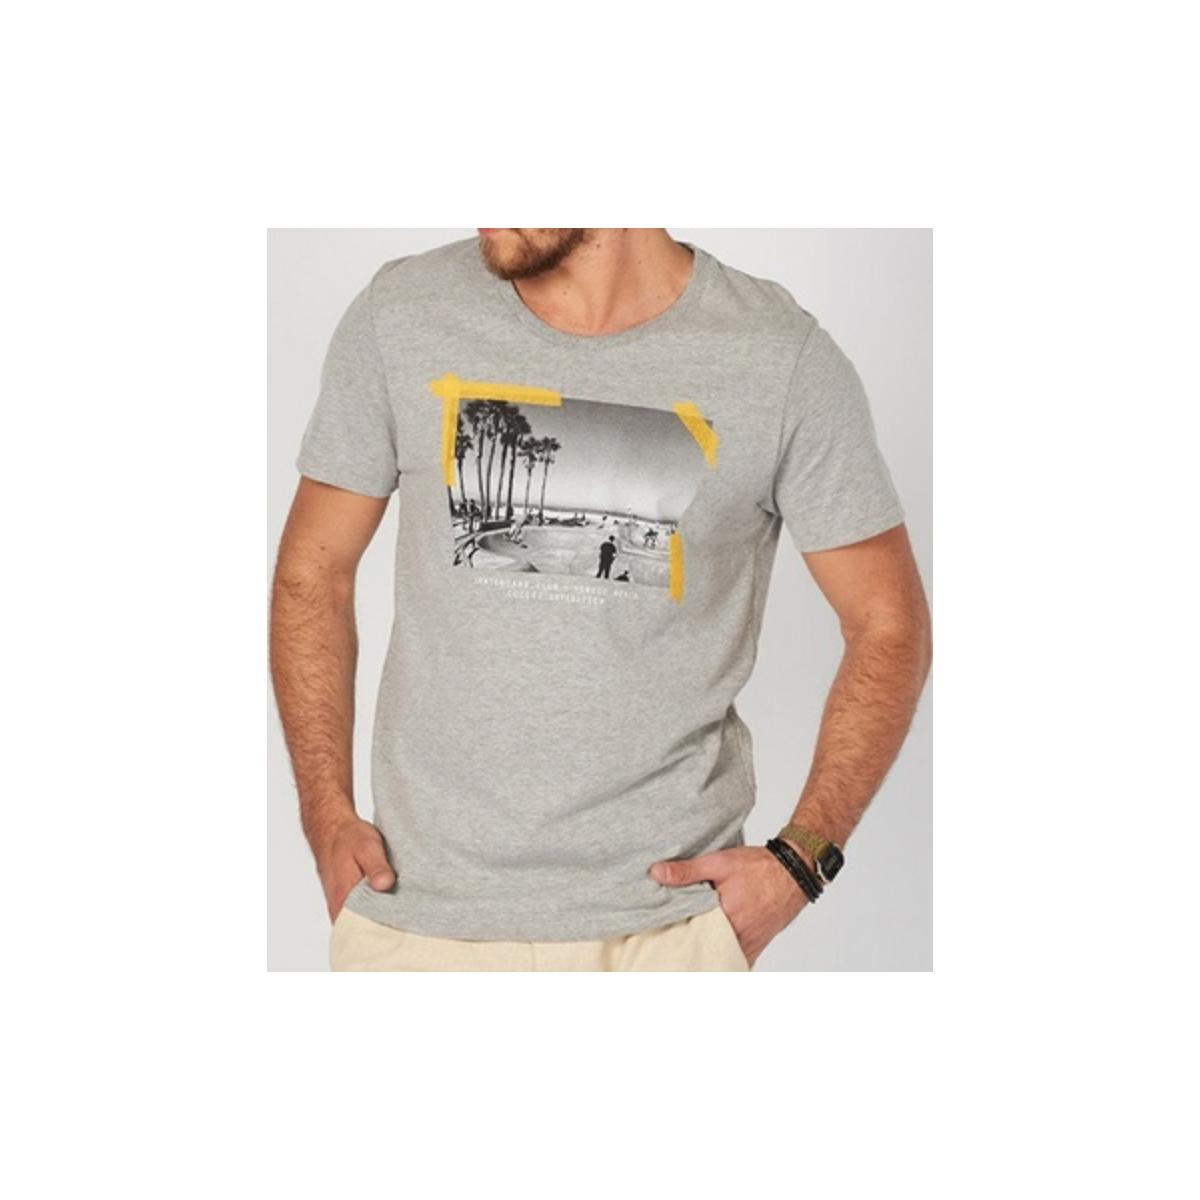 Camiseta Masculina Colcci 350108499 63007 Mescla